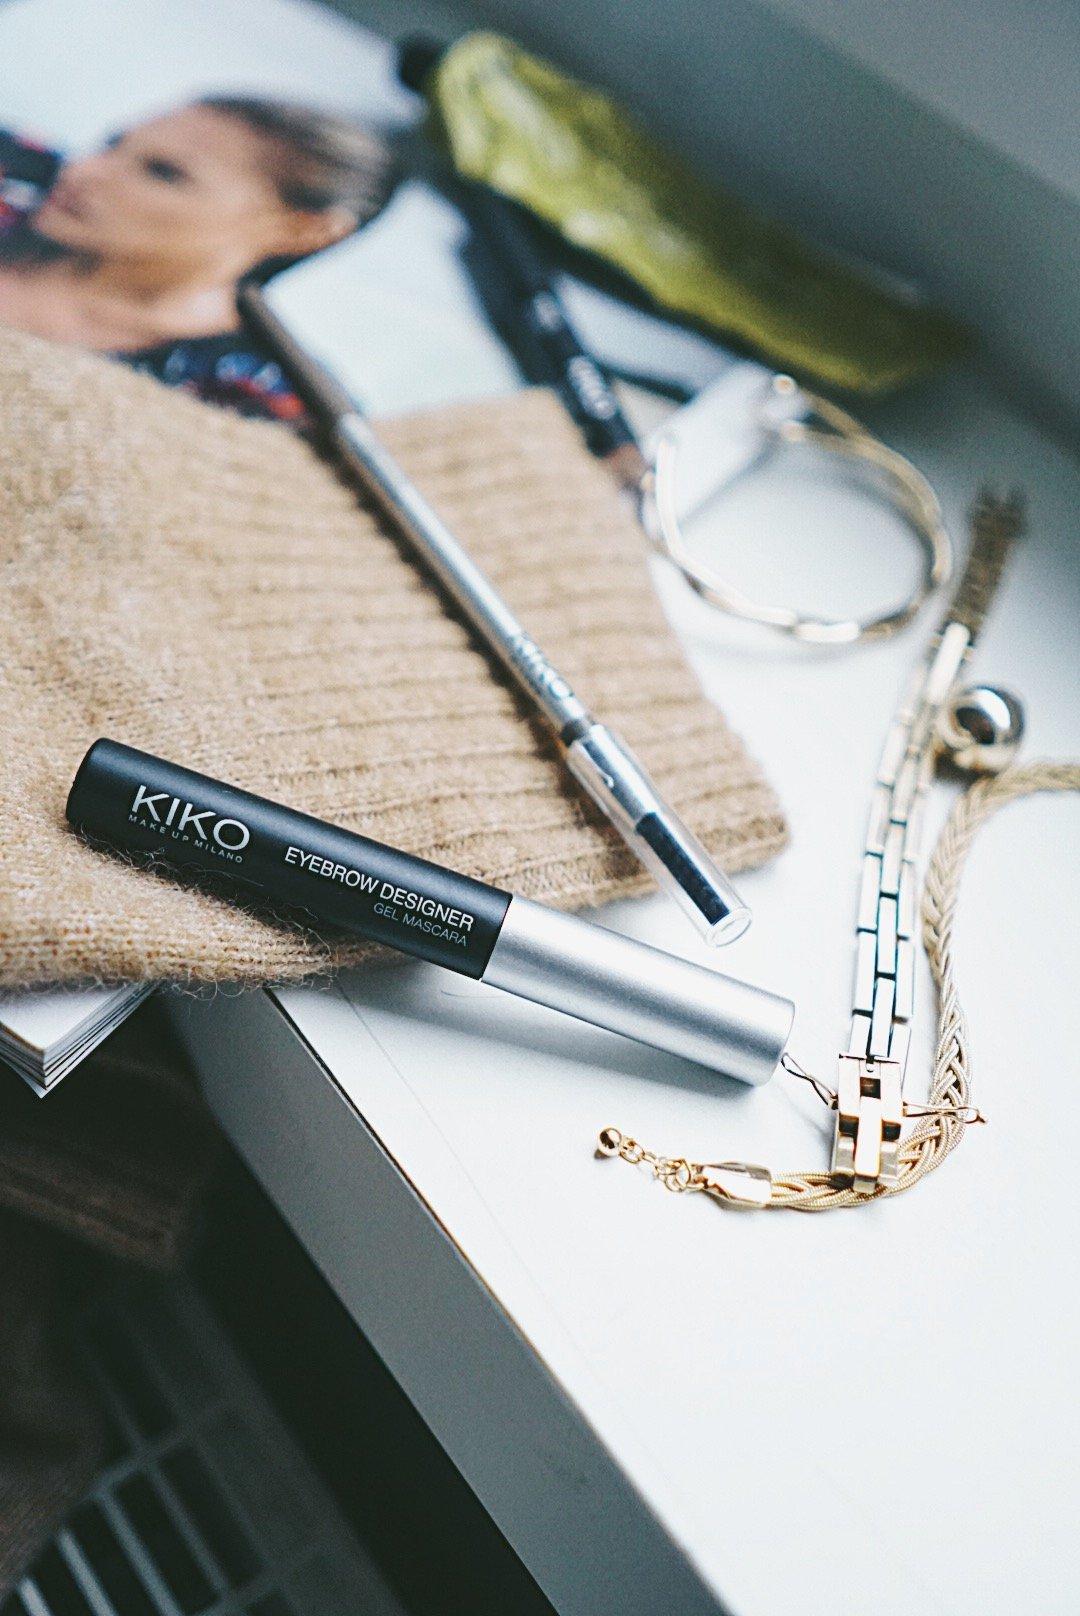 Eyebrow_Designer_Kiko-Augenbrauen_schminken-Nowshine-Beauty-Blog-ü40